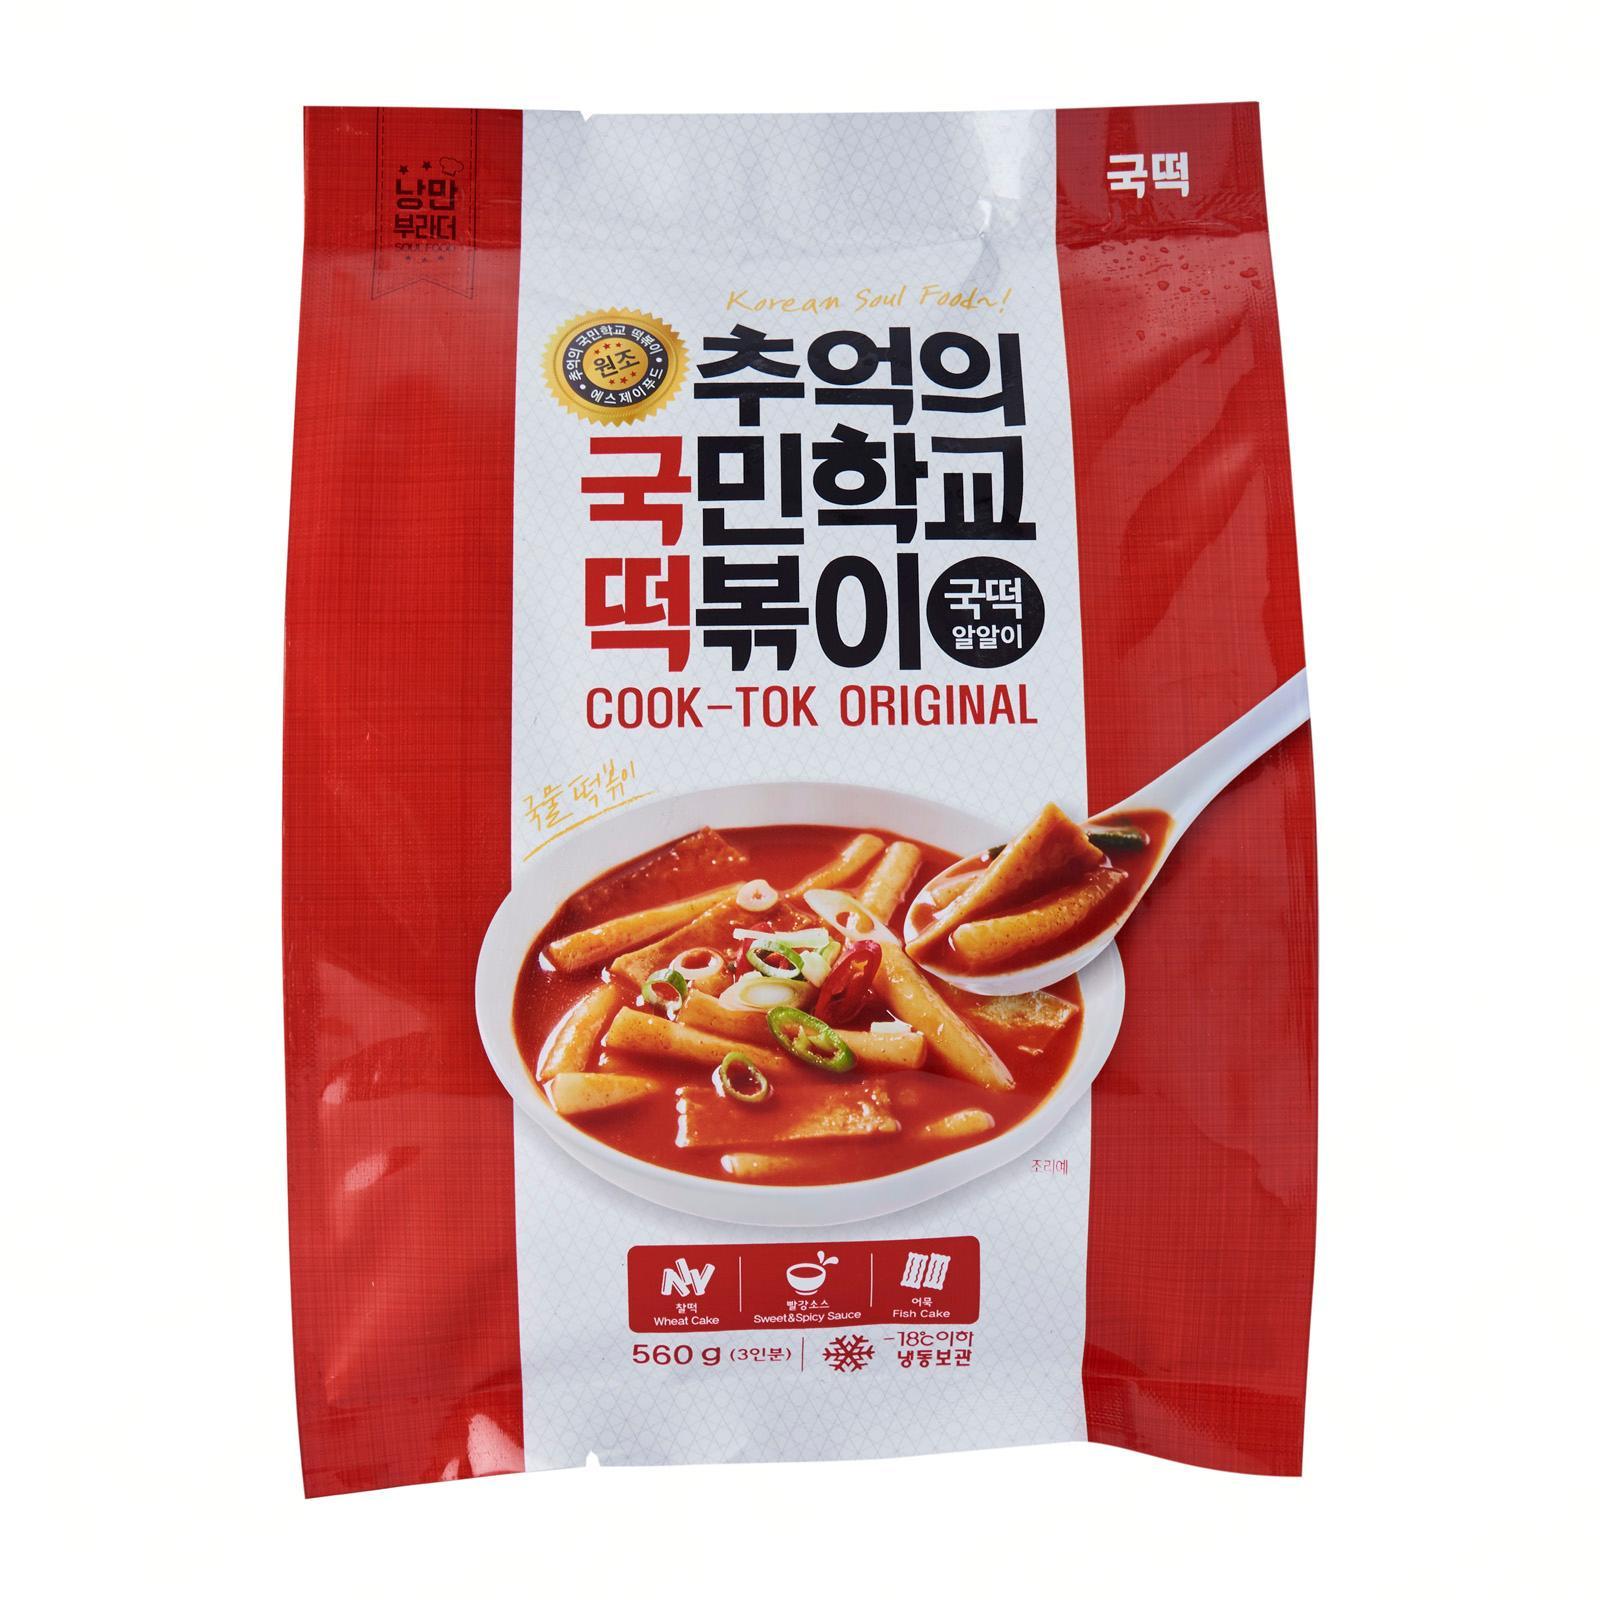 Cook-Tok Korean Spicy Rice Cake (Topokki) Original